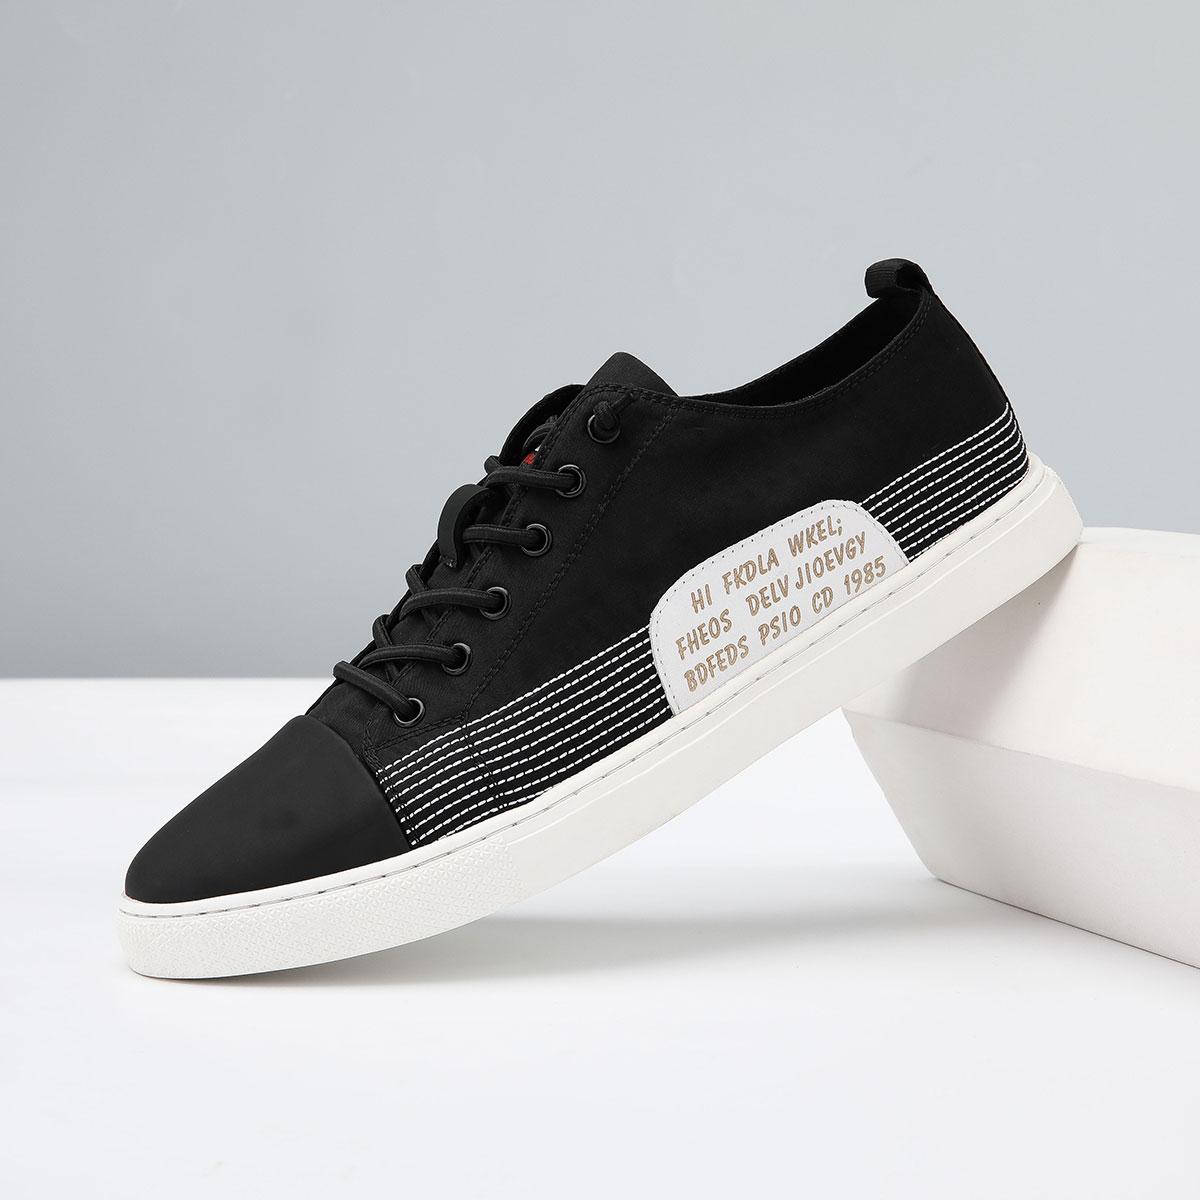 QGSG新款透气潮鞋韩版低帮学生帆布鞋时尚男鞋舒适男士休闲鞋男款板鞋Q9C25006-A1